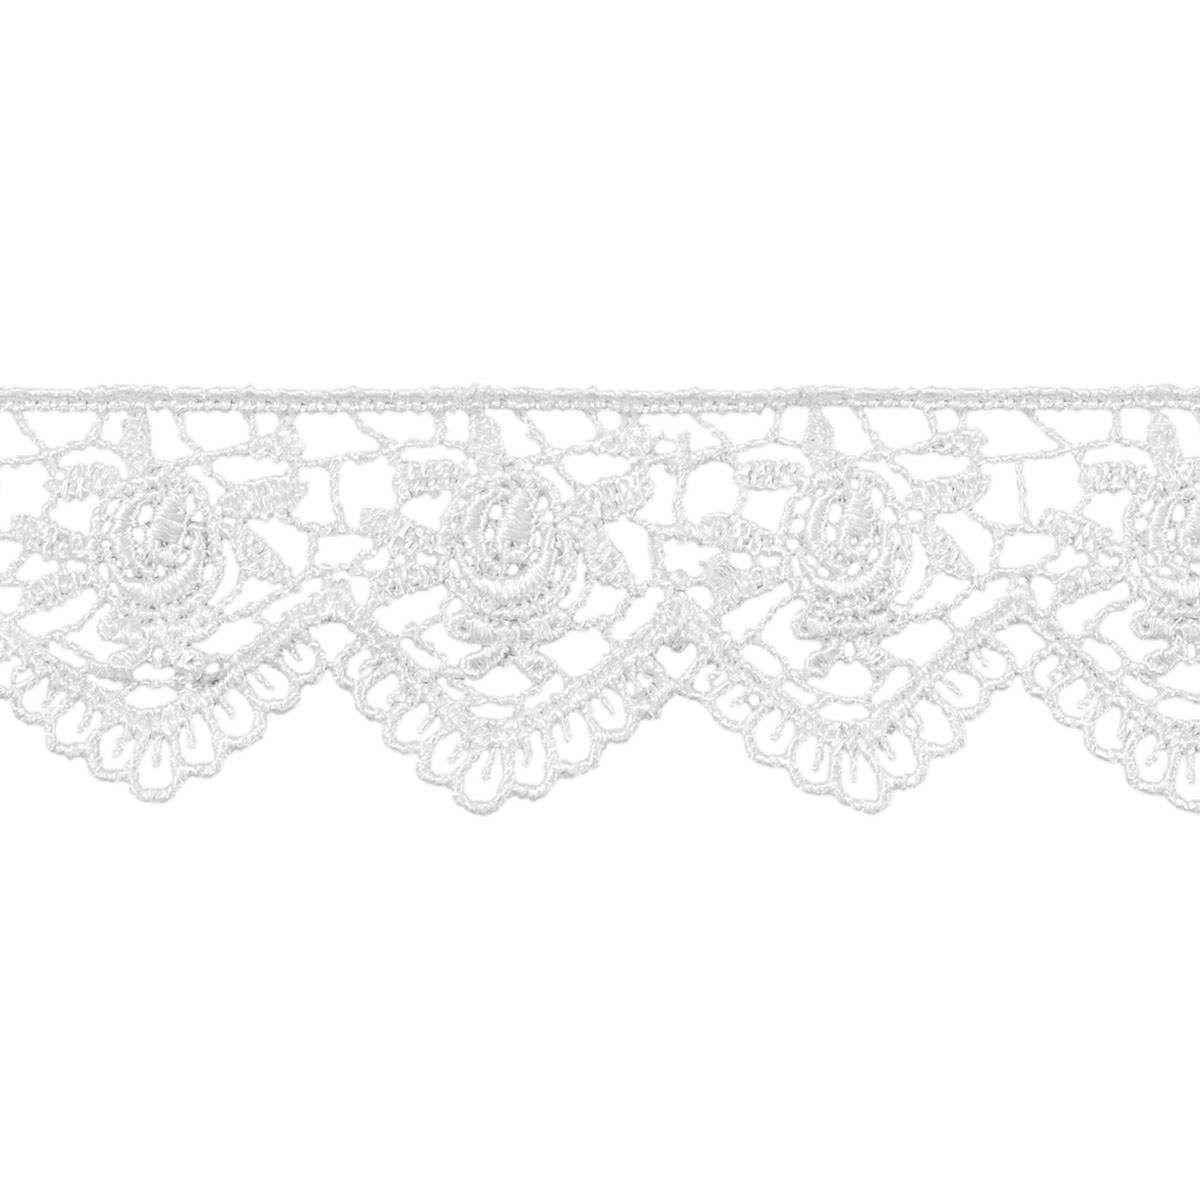 Wrights Venice Rose Scalloped Trim 1.25''x45' White